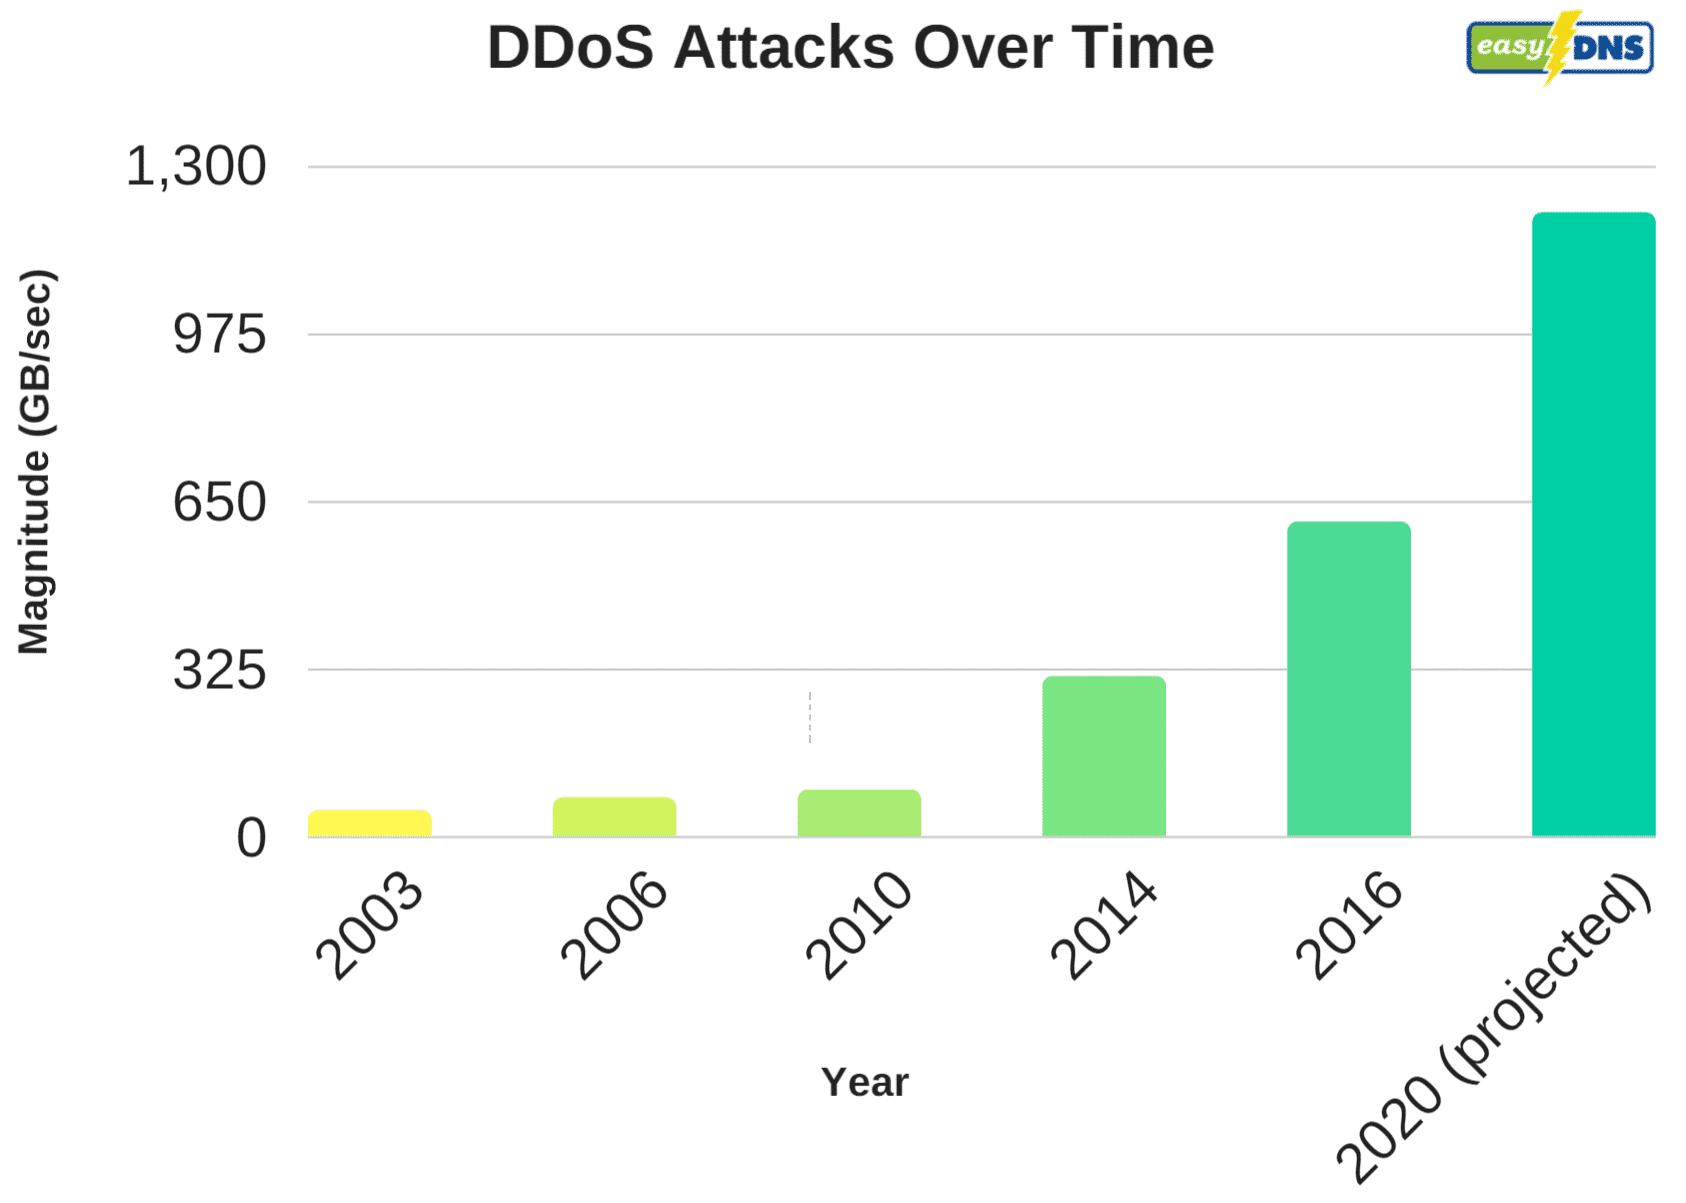 Les attaques DDoS au fil du temps